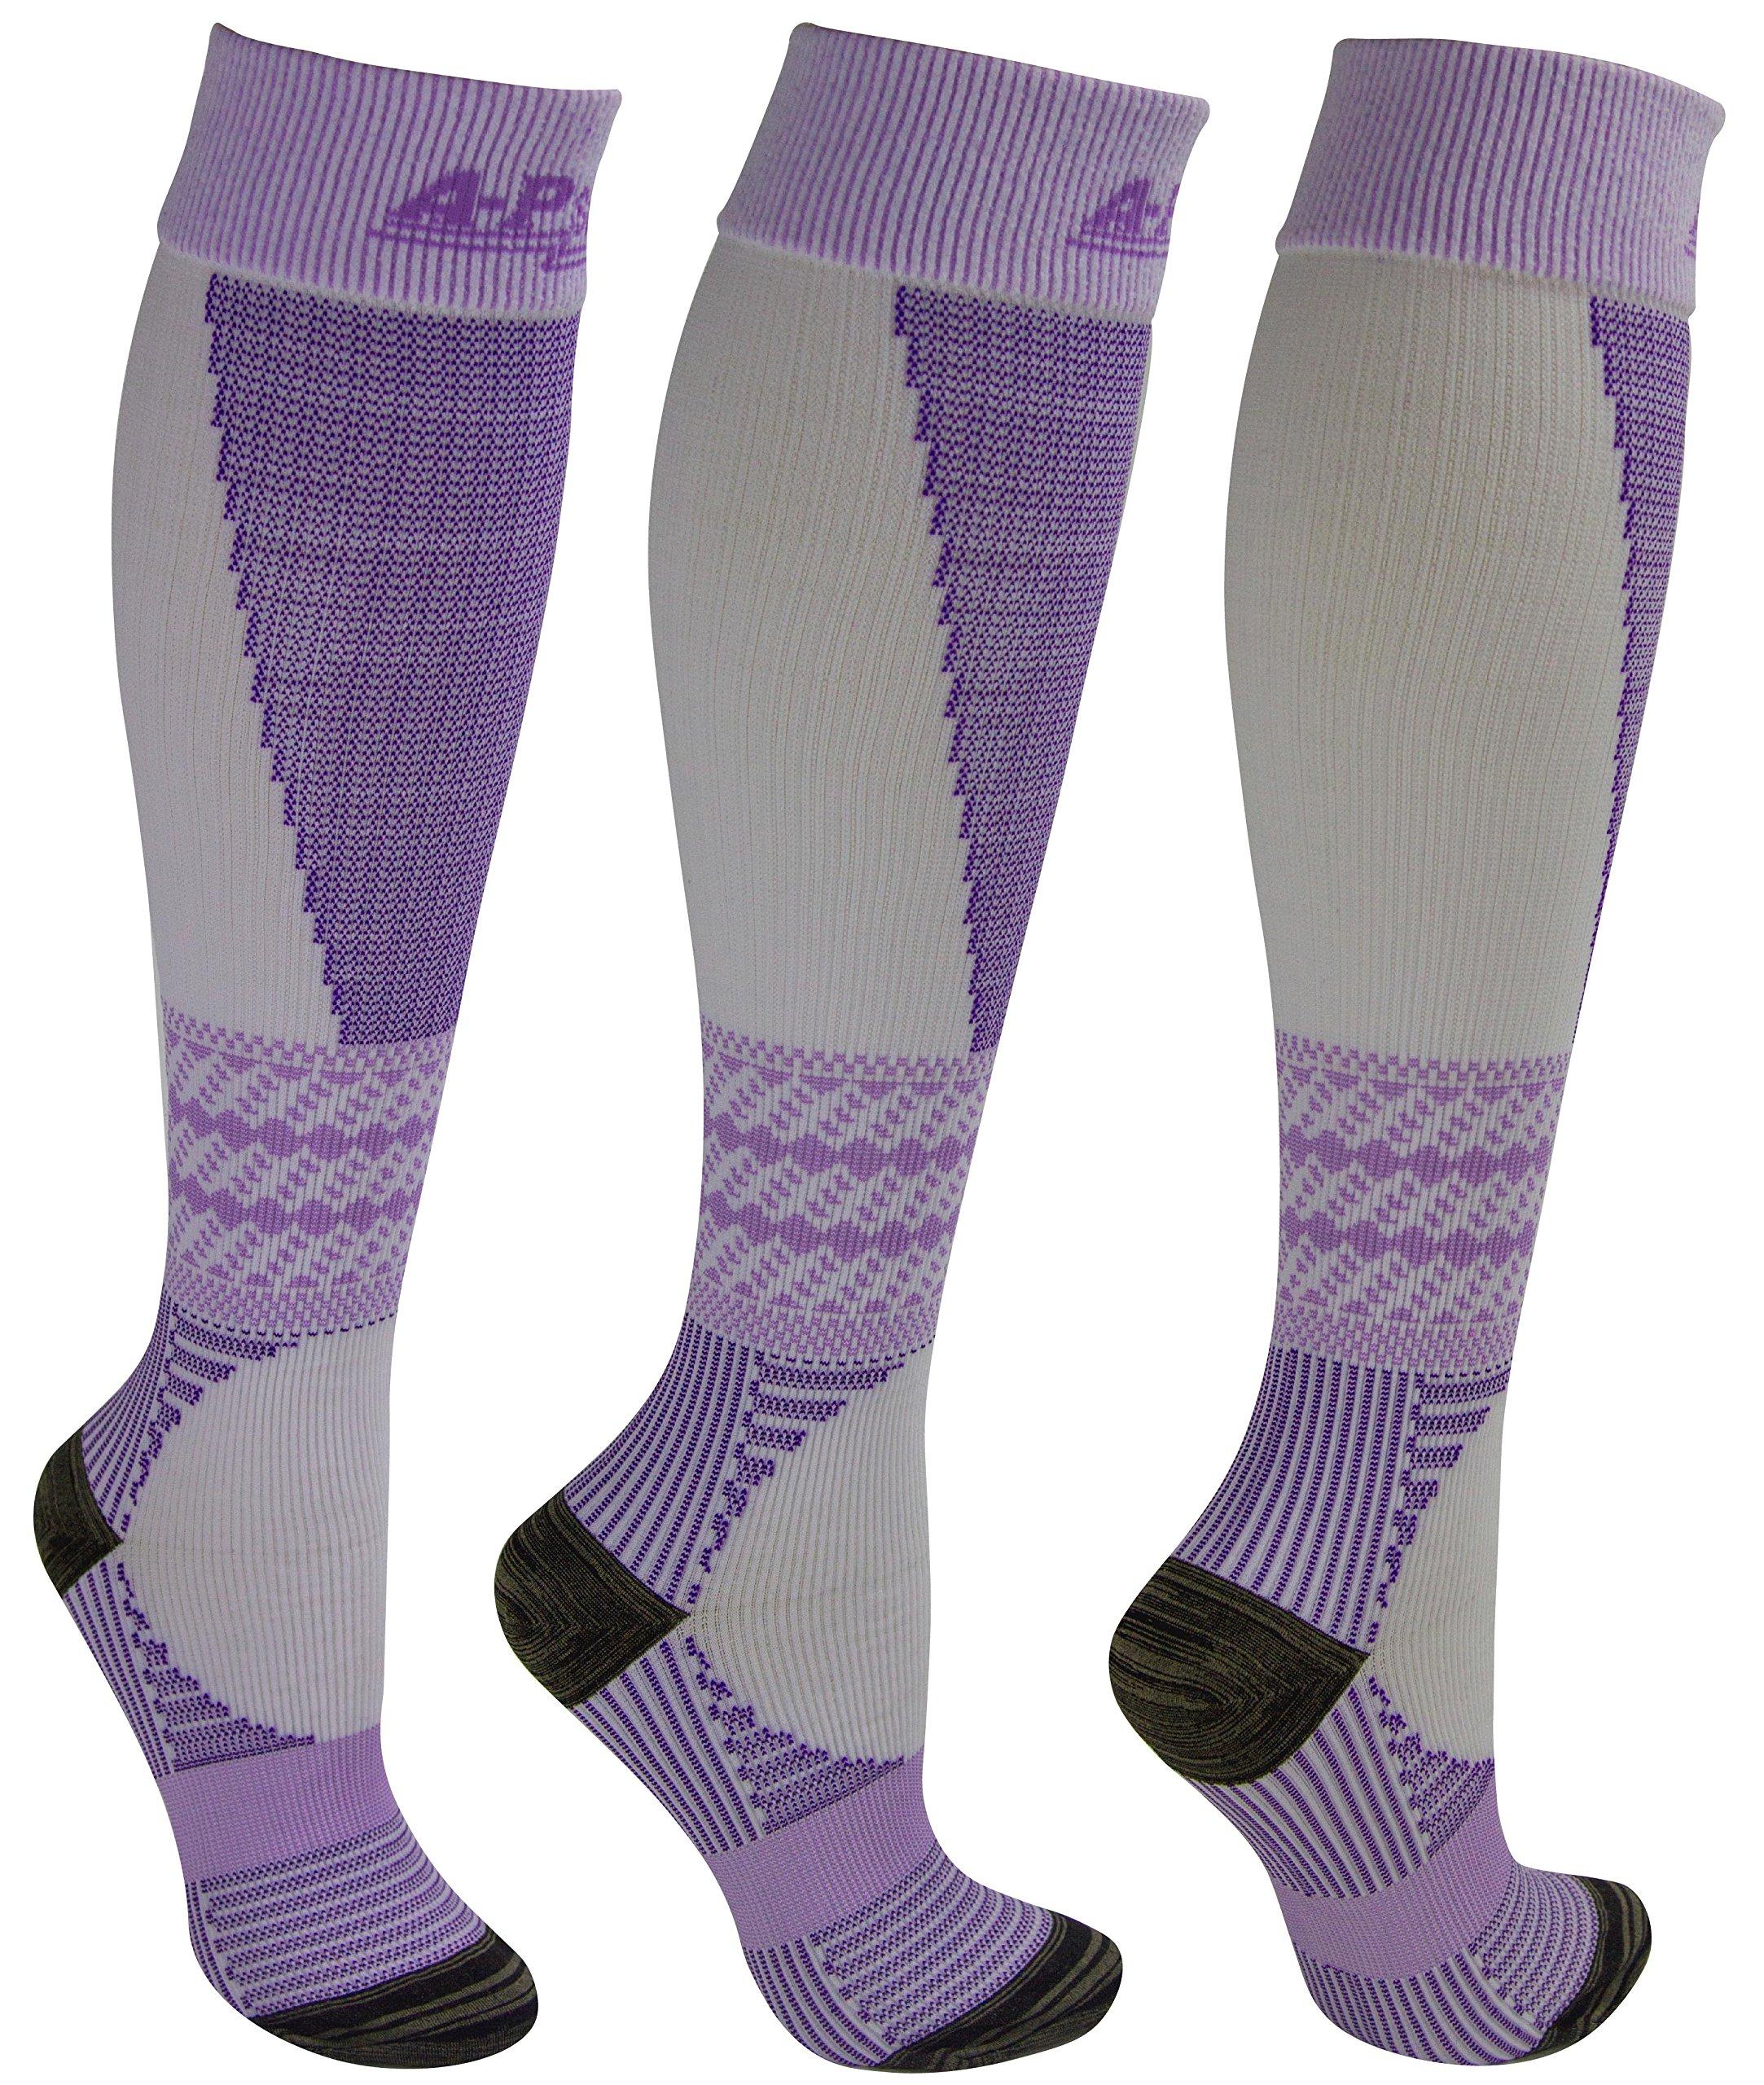 New Generation Compression Socks 15-20 mmHg for Men & Women – Best Graduated Pressure Stocking, Support Circulation Socks   Athletic Fit for Running Socks, Nurses, Maternity Pregnancy, Flight Travel